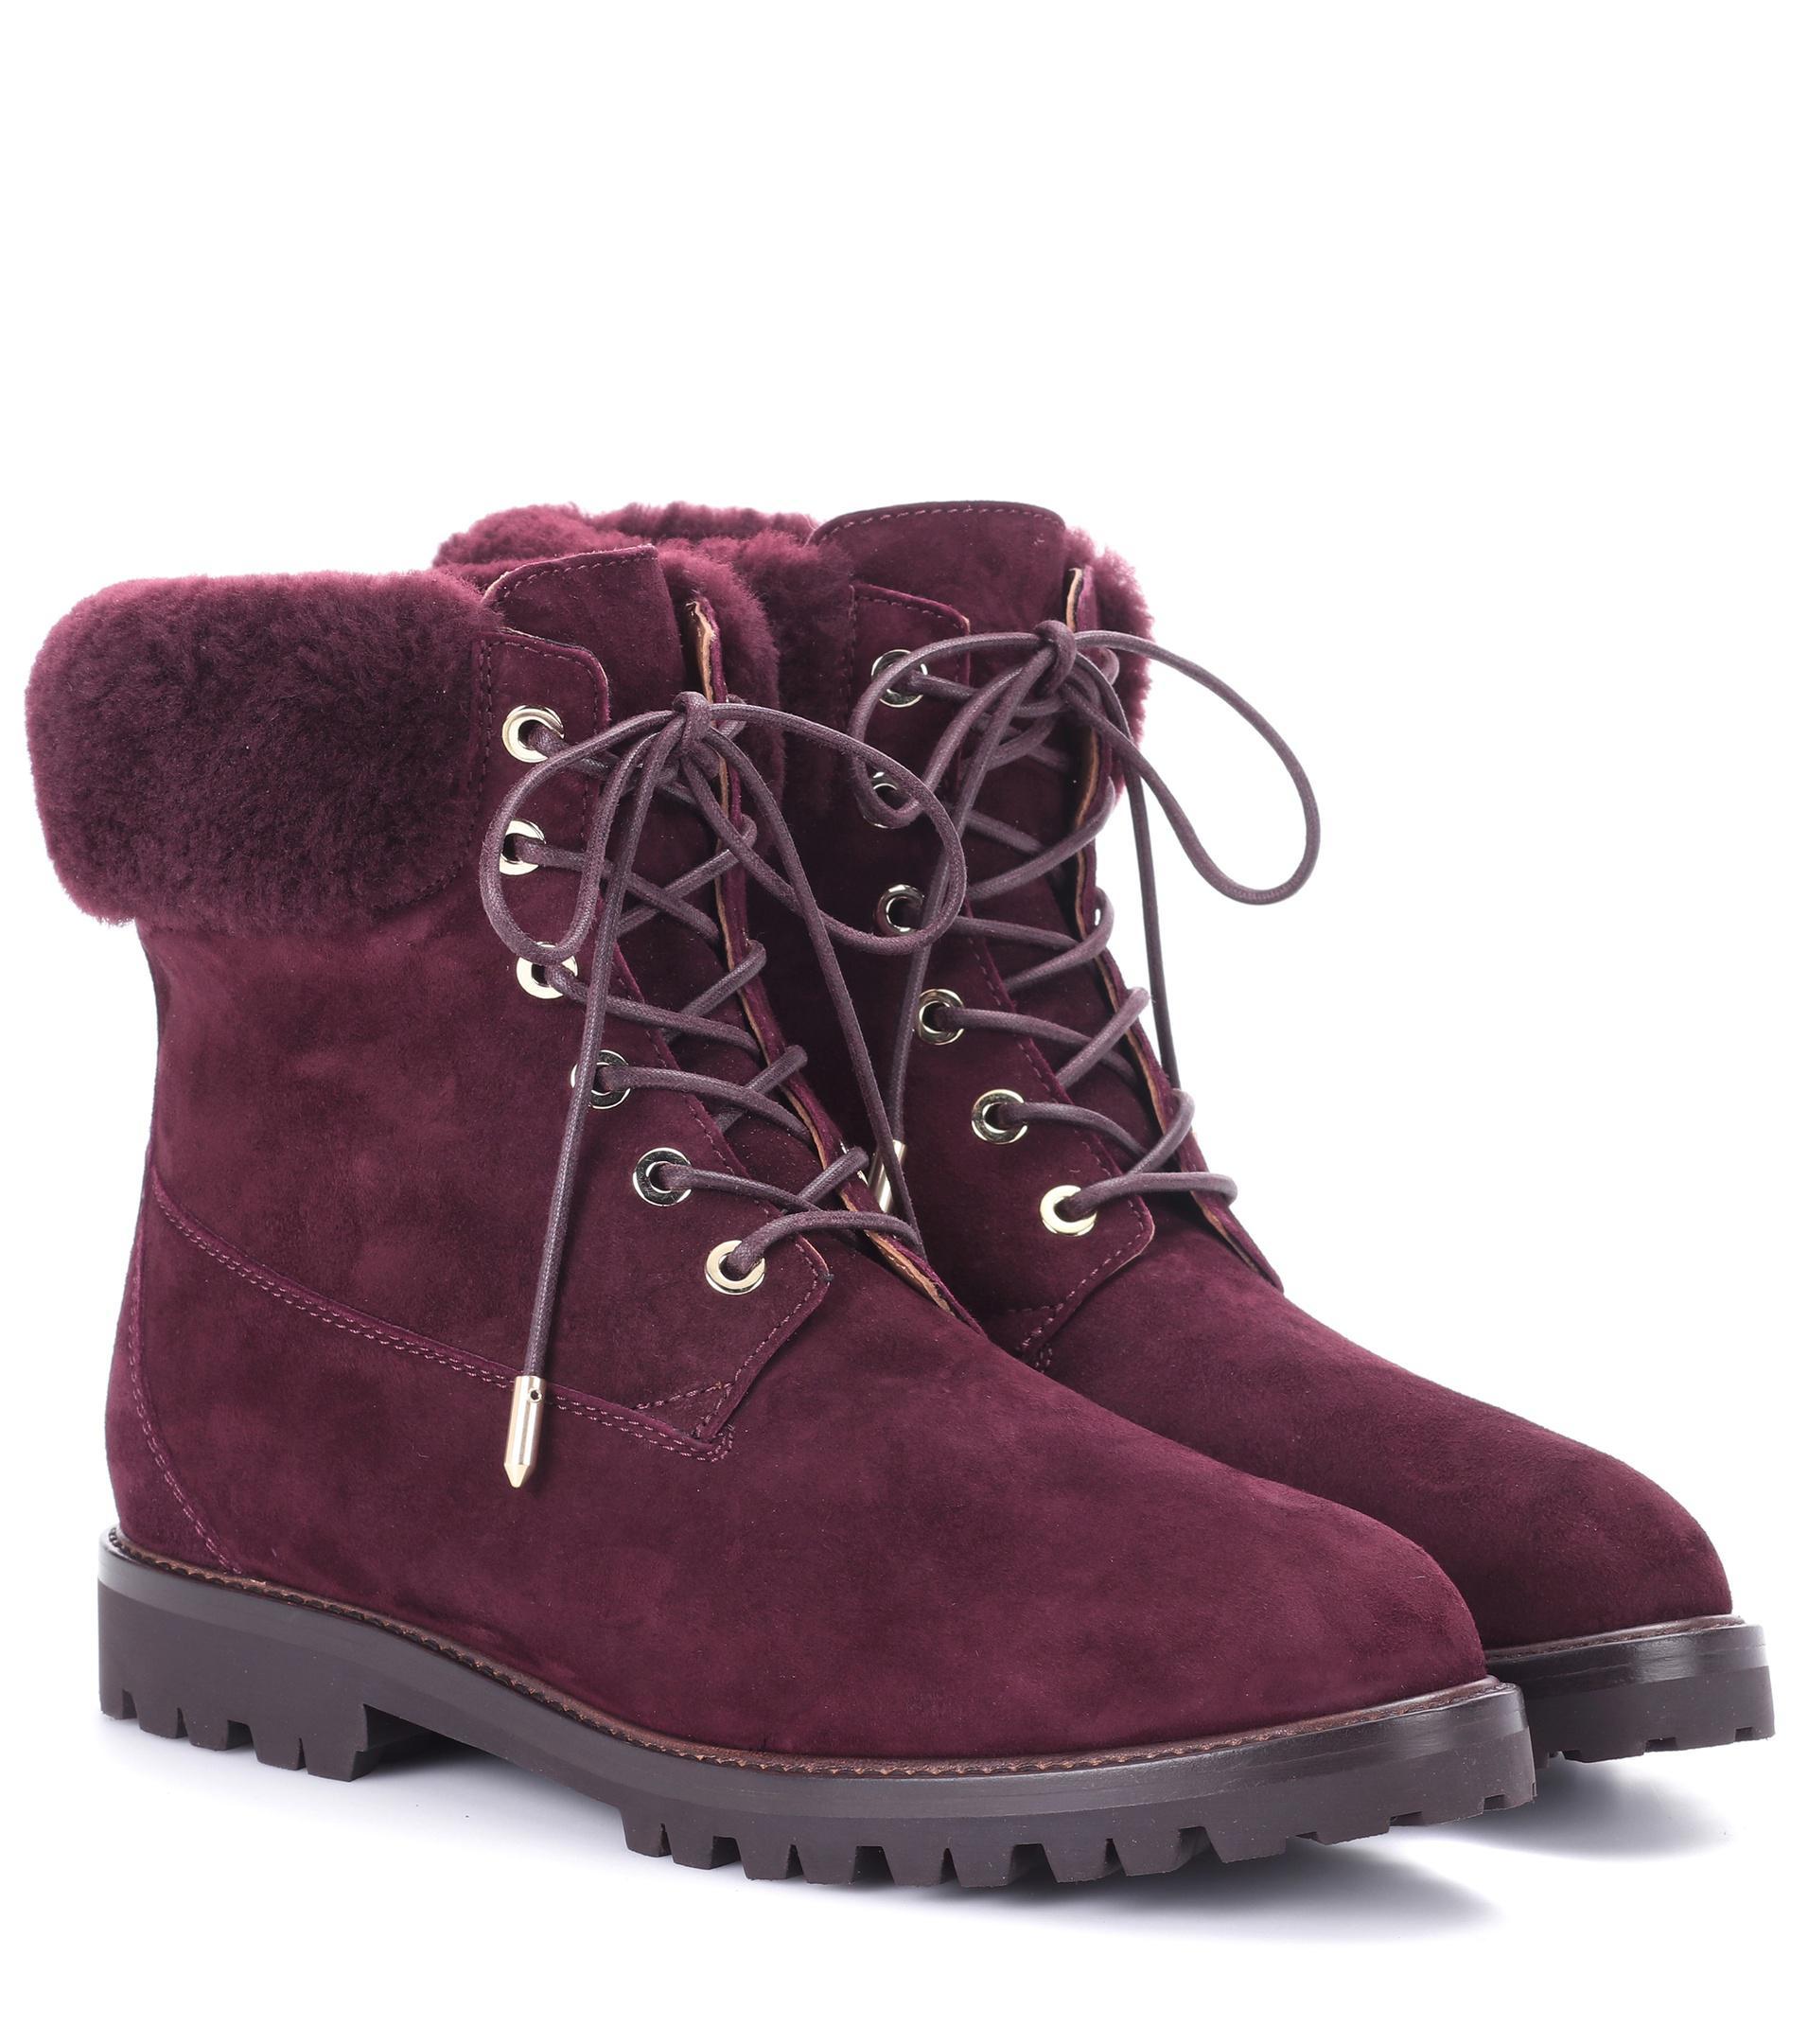 Aquazzura Mink-Trimmed The Heilbrunner Ankle Boots geniue stockist kVJXoQOjQ